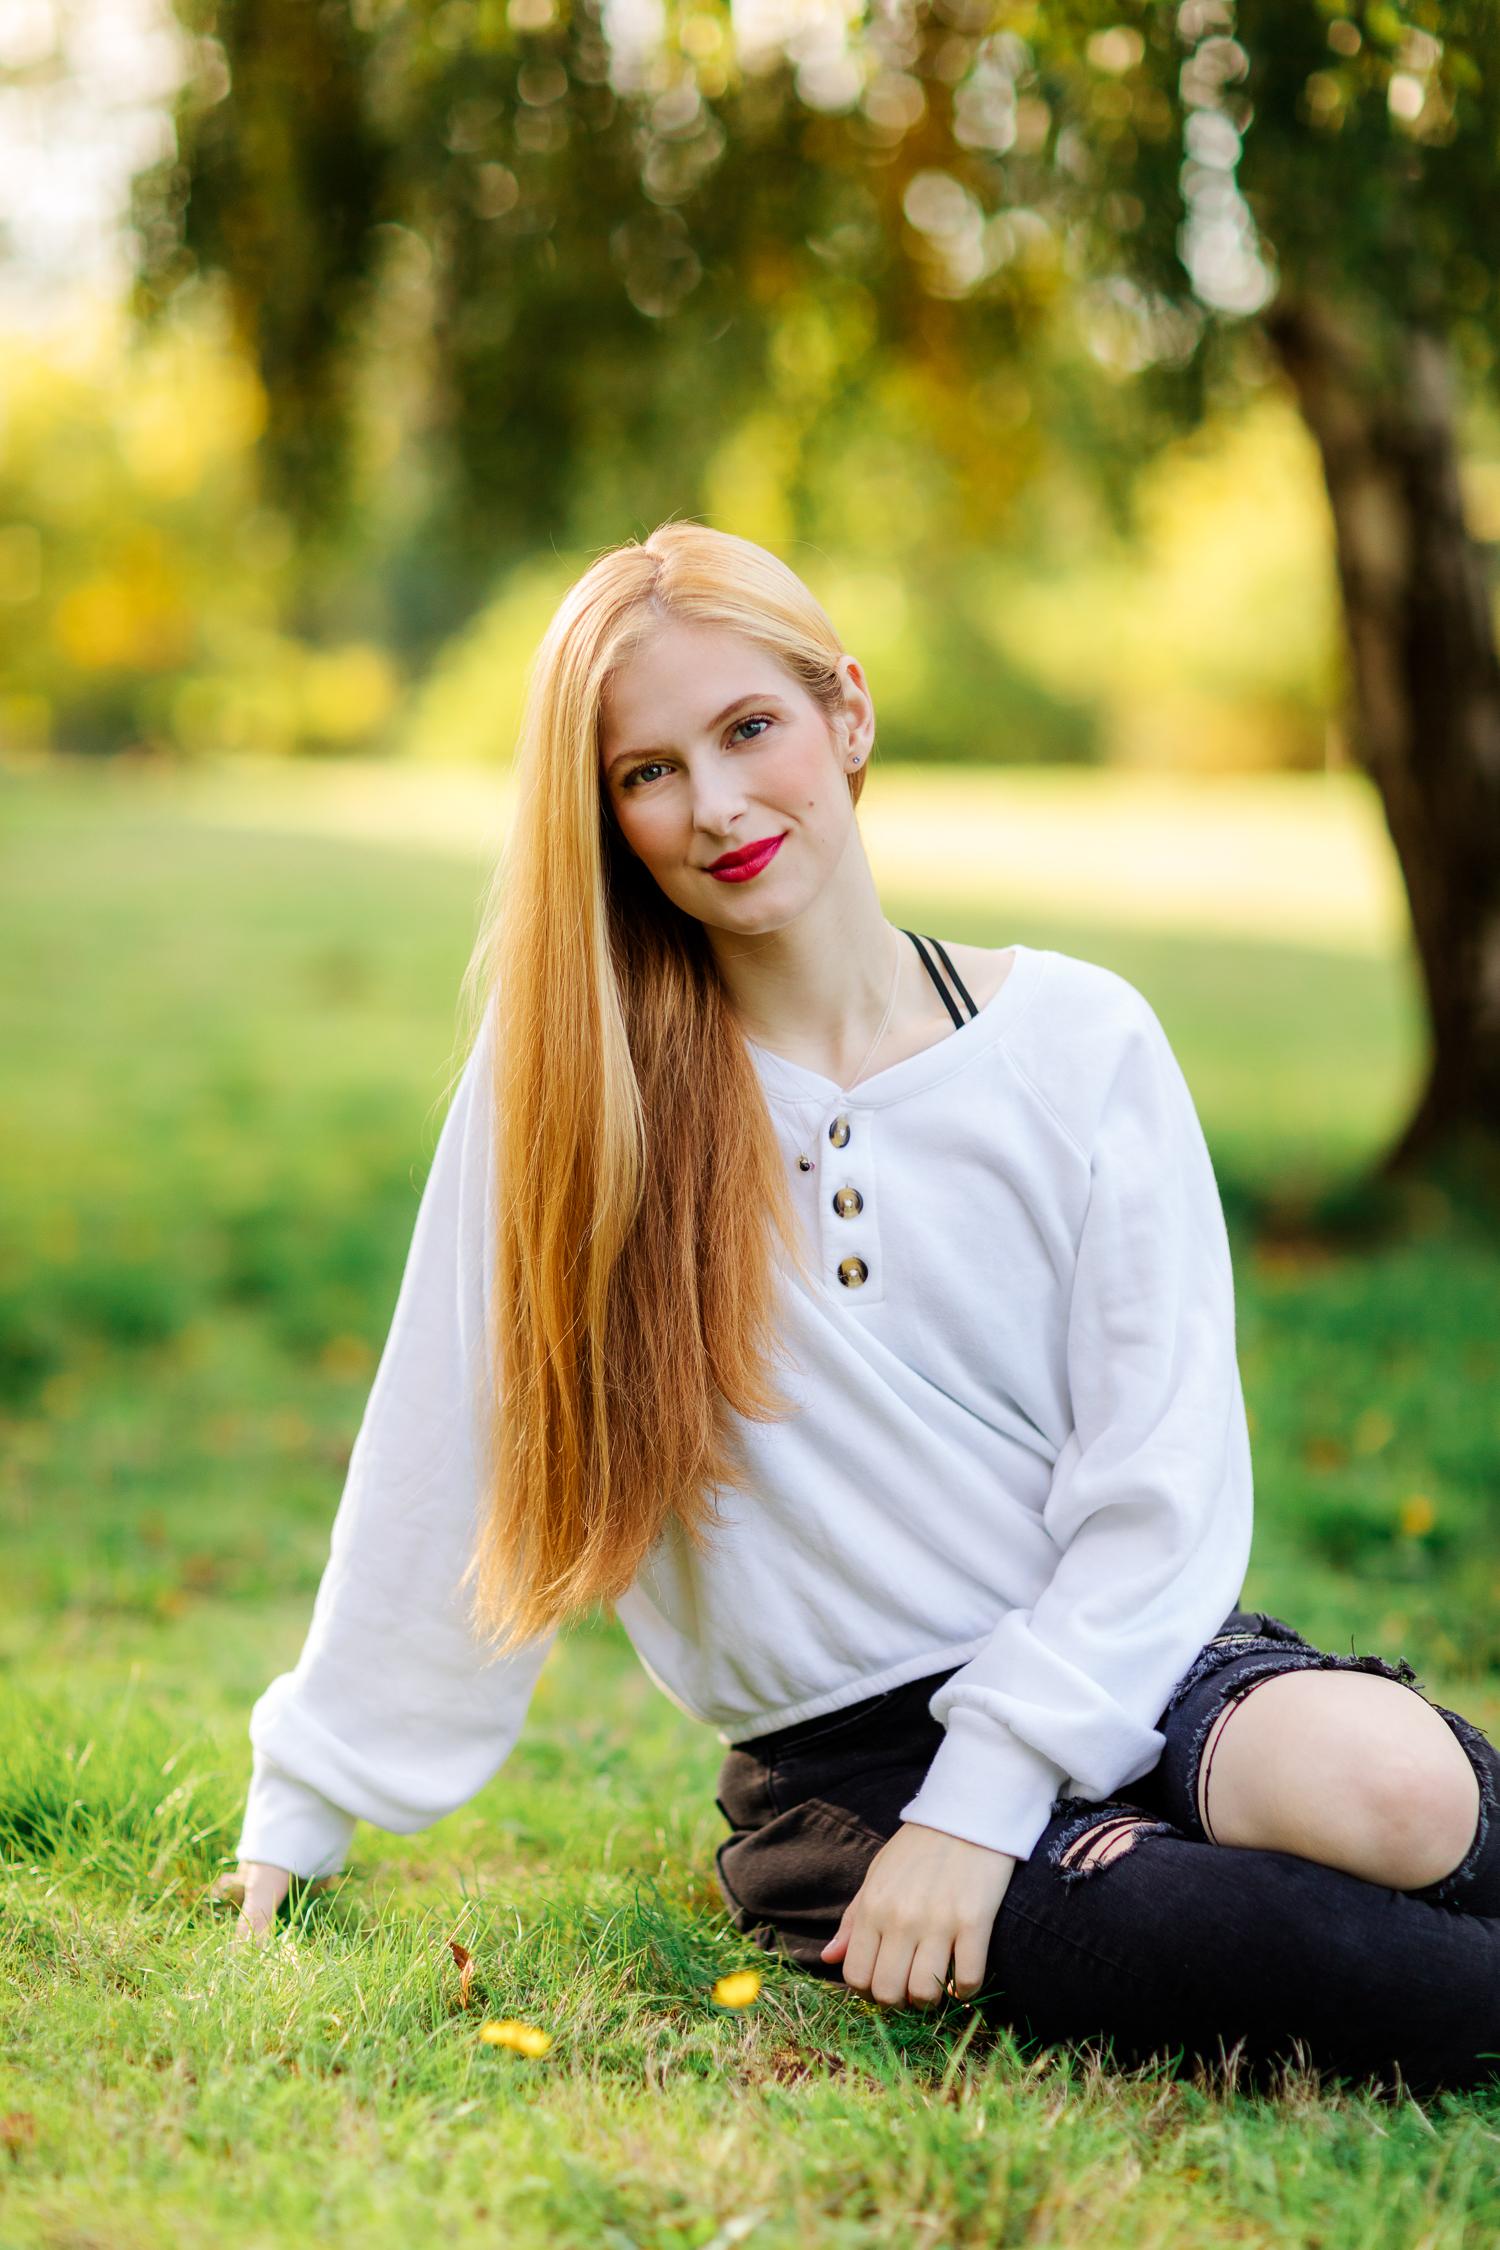 ariella-noelle-photography-seattle-area-senior-portraits-redmond-high-school-newport-bellevue-15.jpg